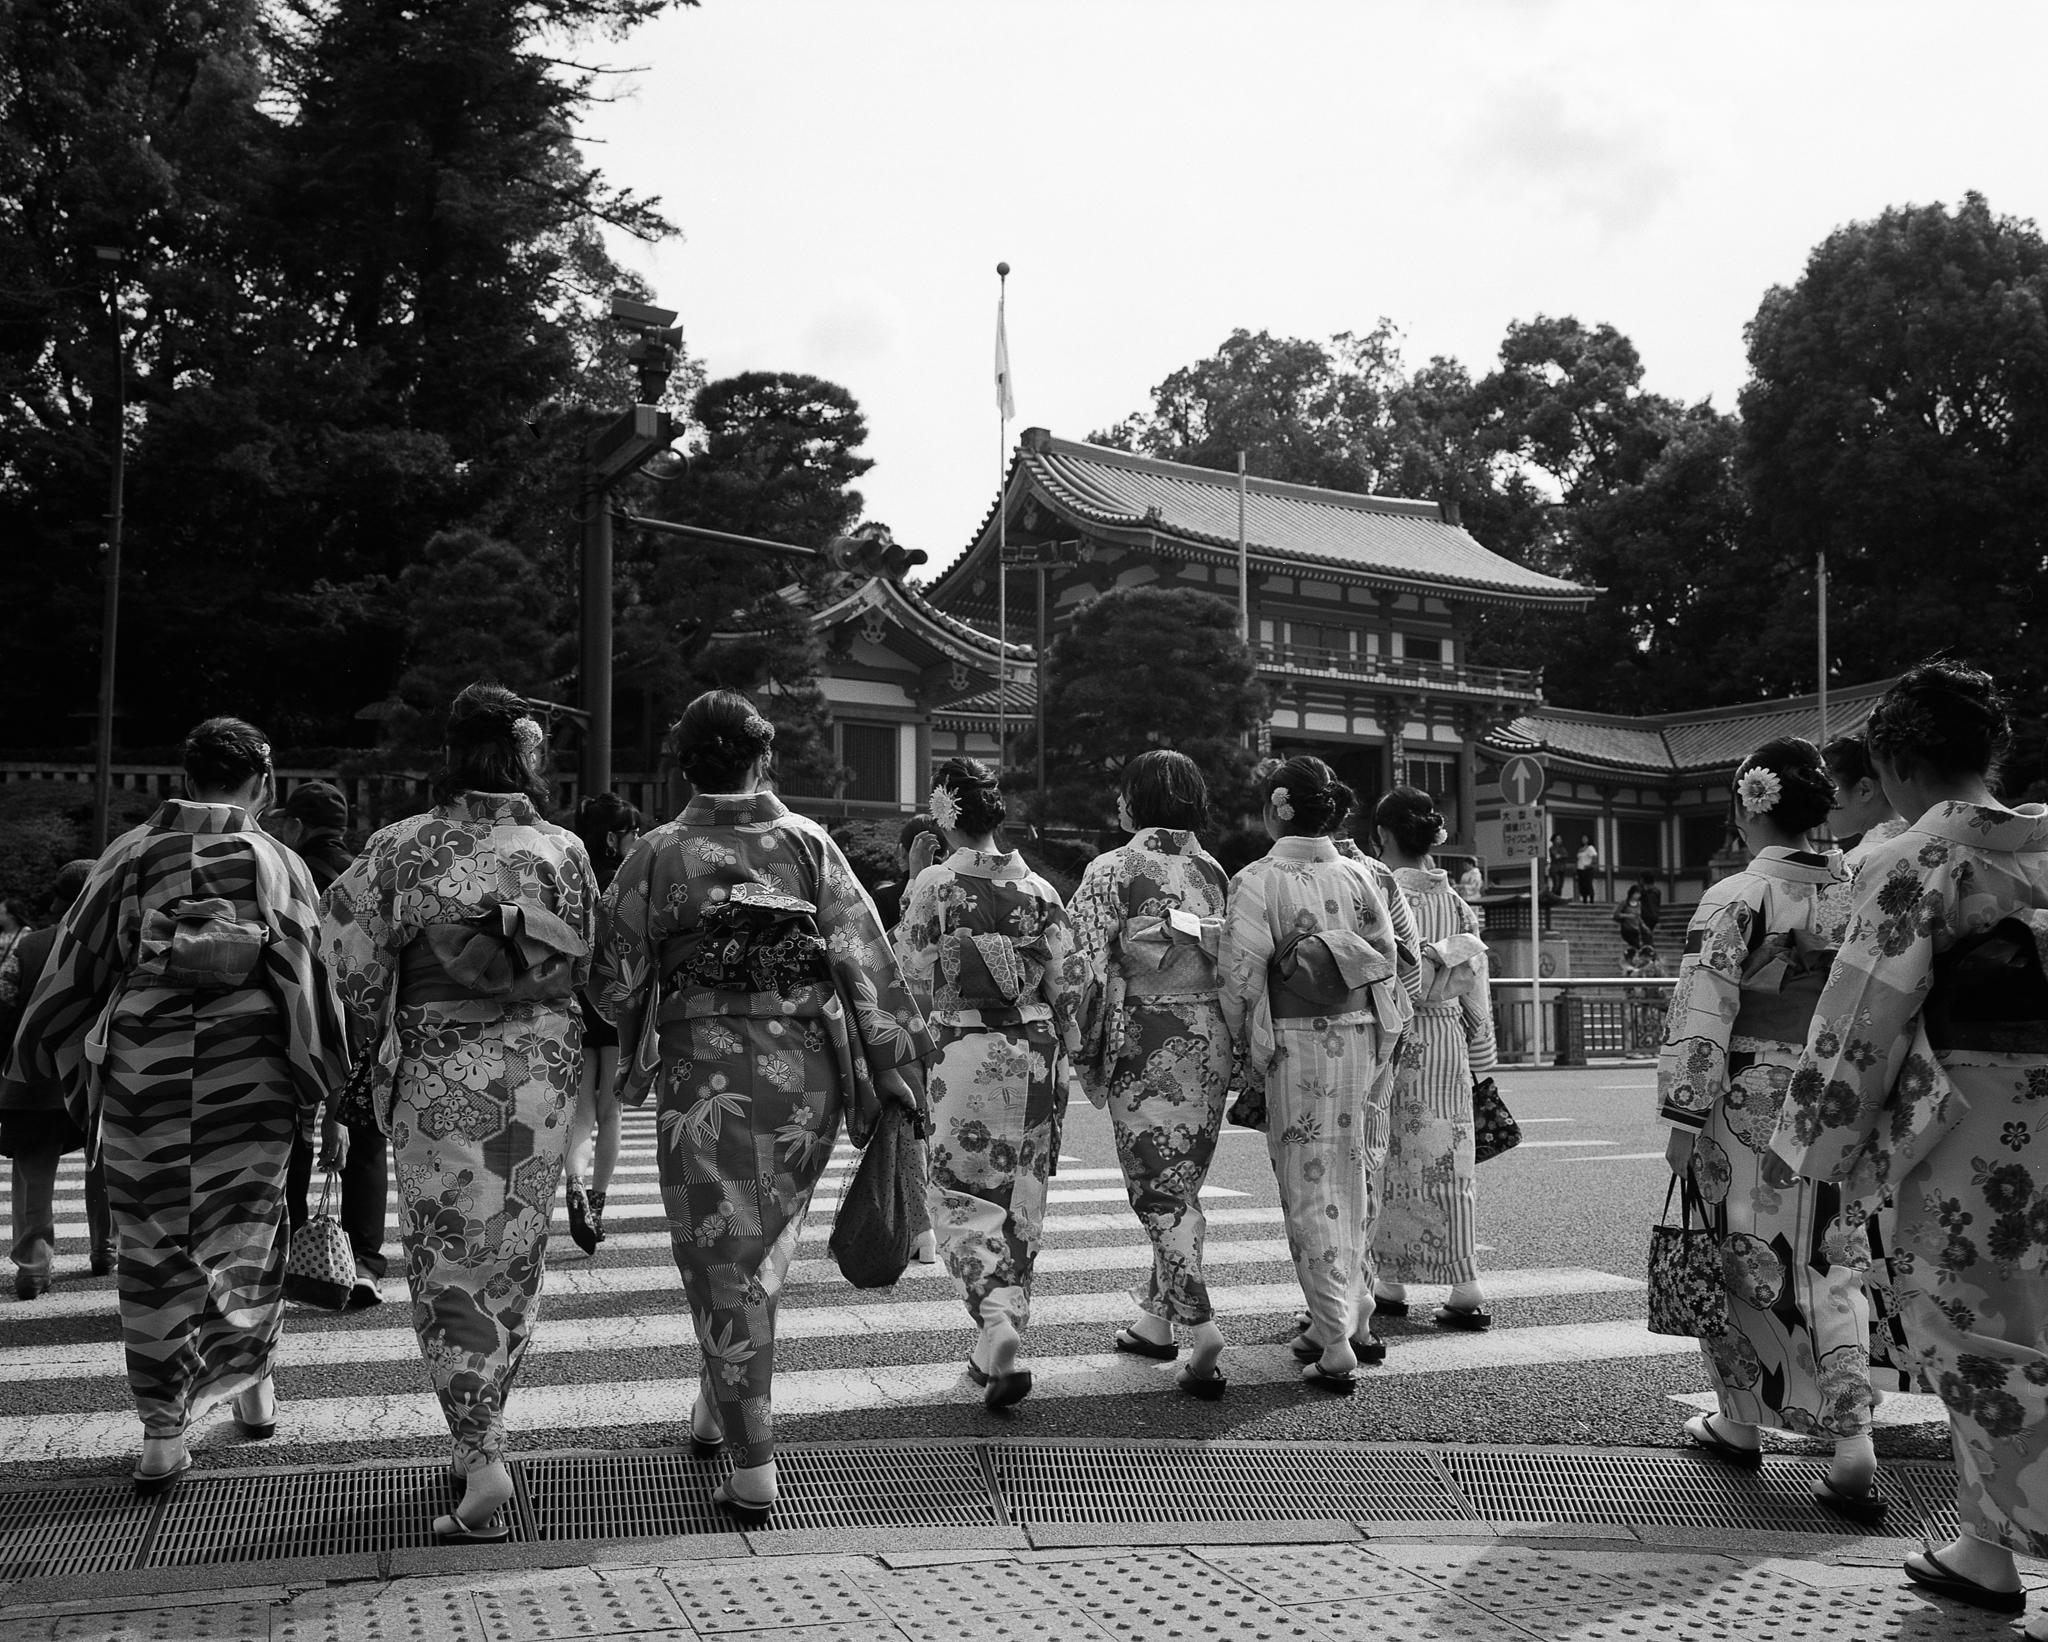 Kimono girls in Kyoto (Mamiya 7II Ilford HP5+)